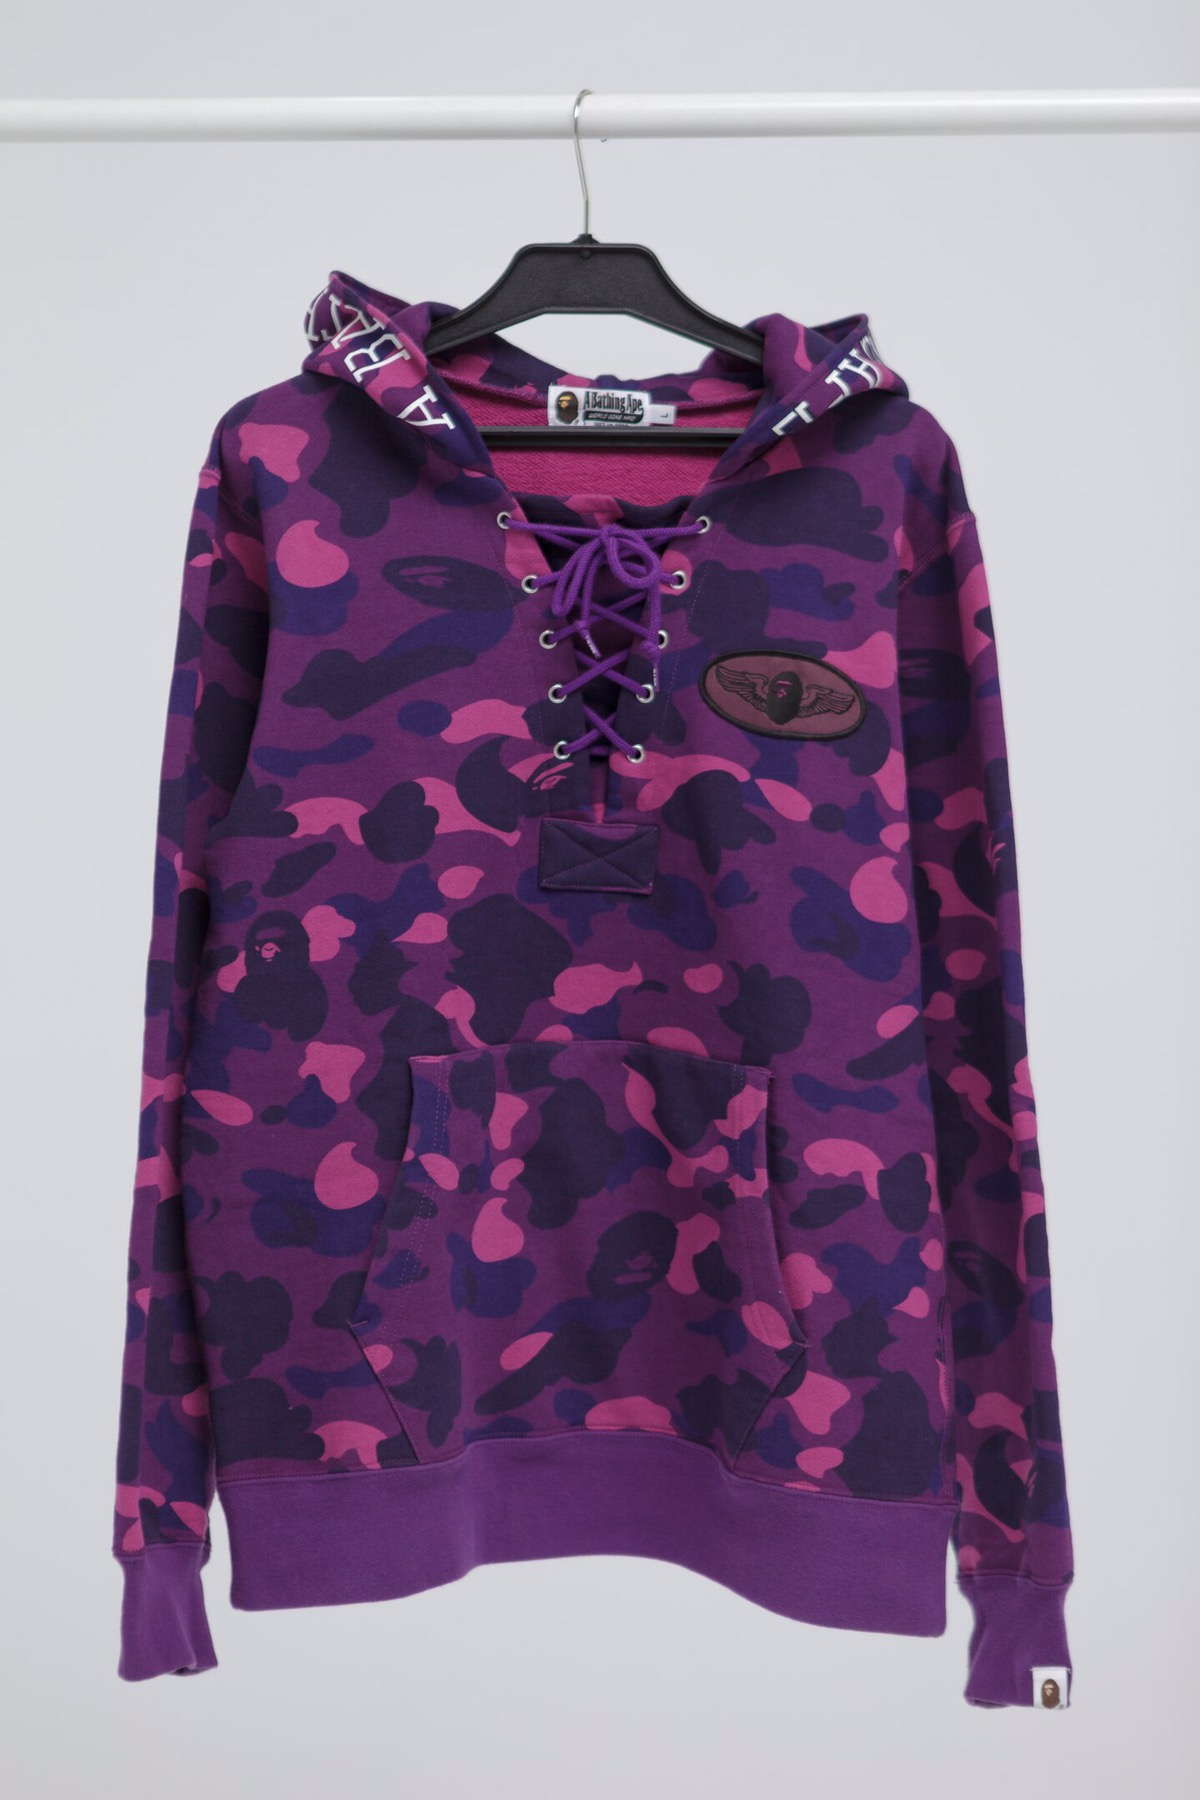 682857d6d0fa Bape A Bathing Ape Color Purple Camo Lace Up Pullover Hoodie 16FW Size l -  Sweatshirts   Hoodies for Sale - Grailed